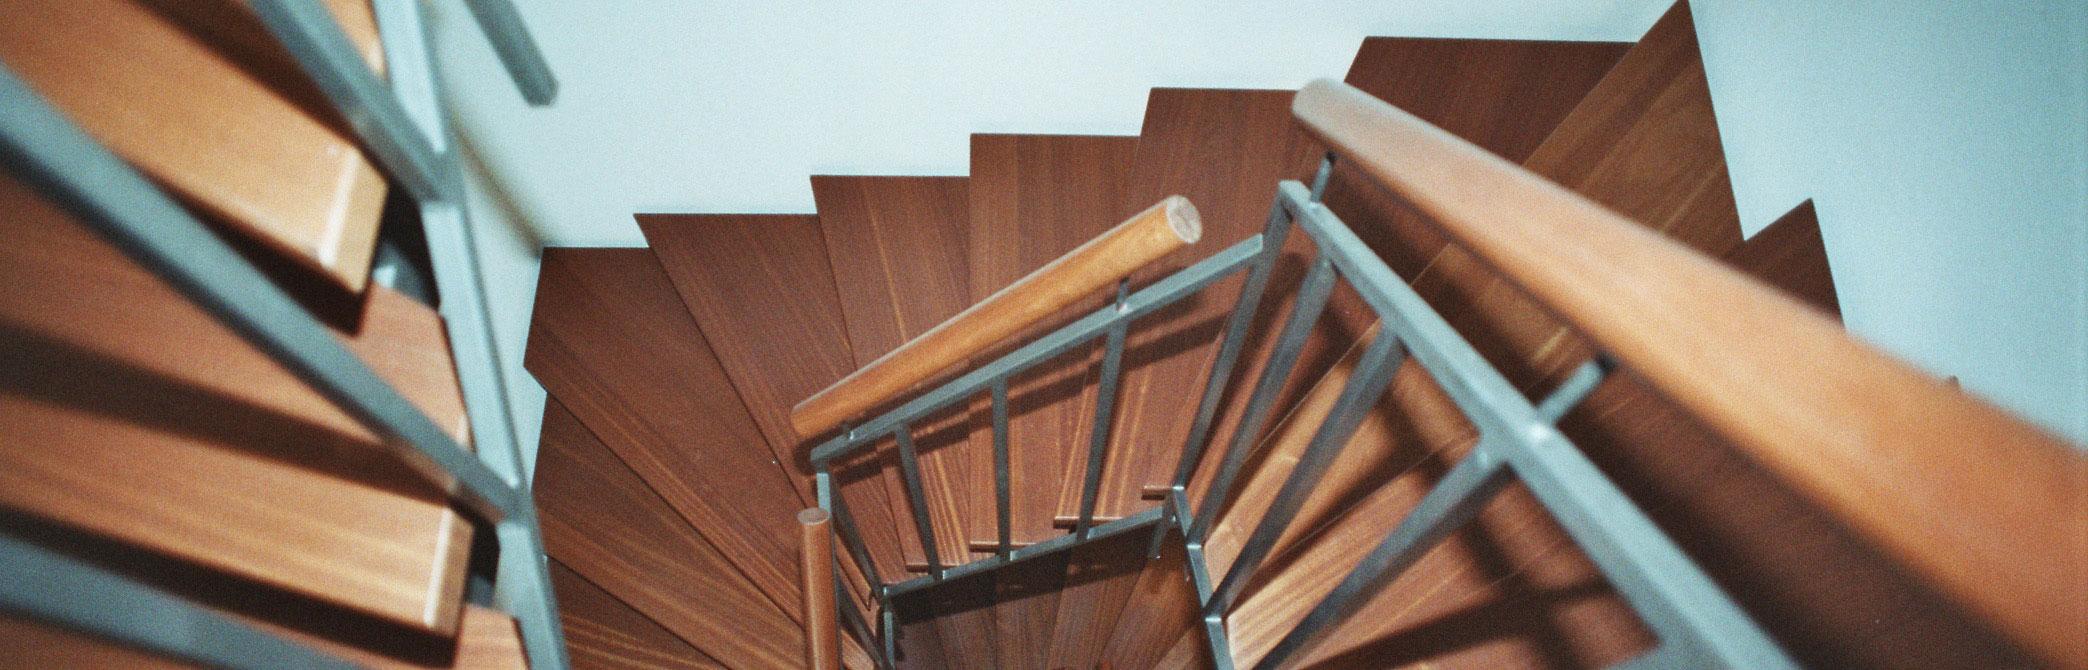 treppenstufen aus holz treppenstufen holz auf metall kleben treppenstufen knarren was k nnen. Black Bedroom Furniture Sets. Home Design Ideas